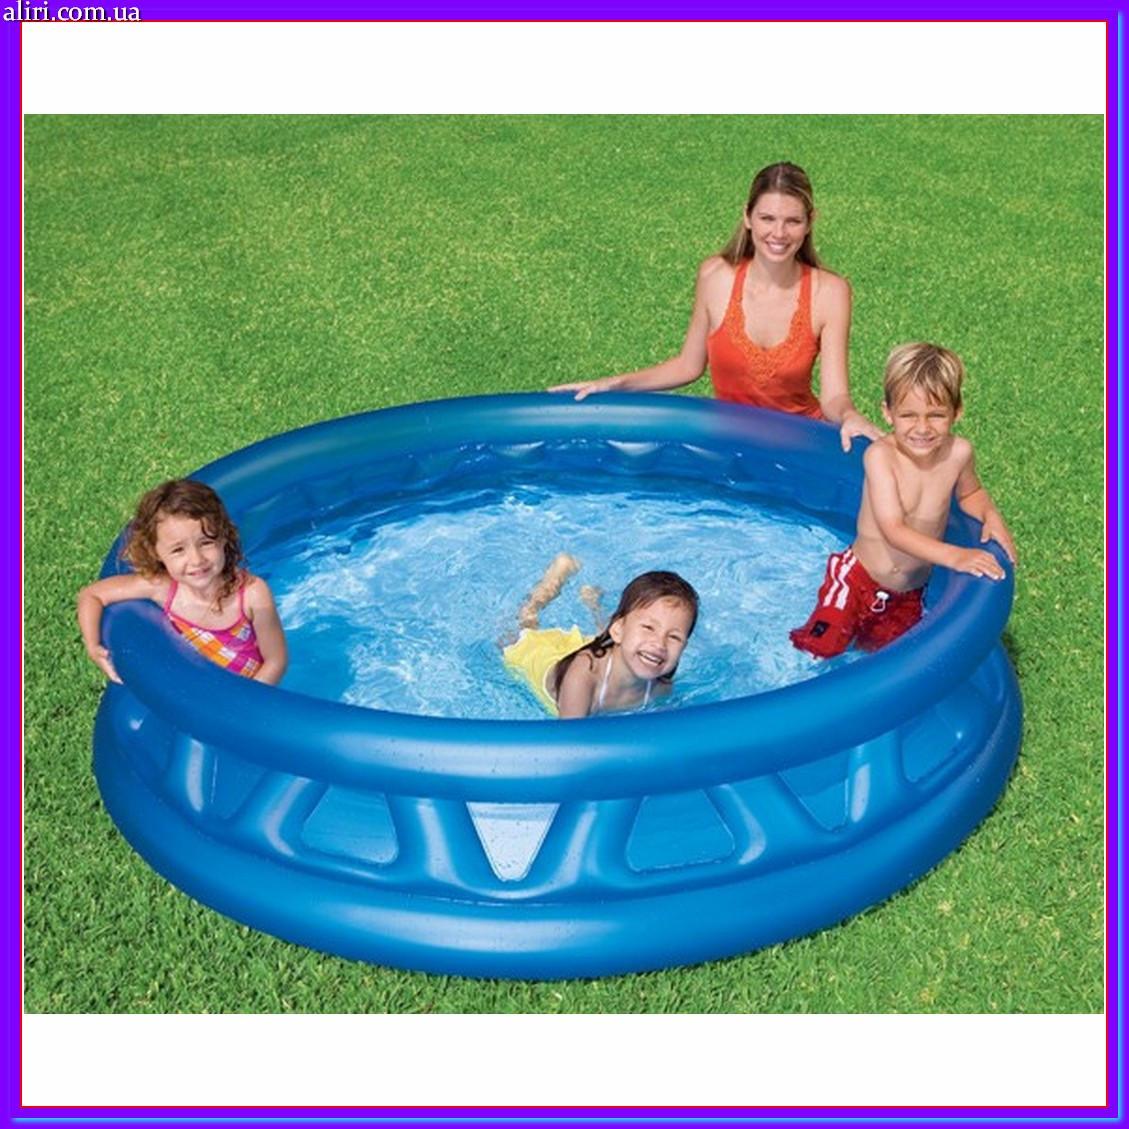 Детский бассейн Intex 58431 Конус